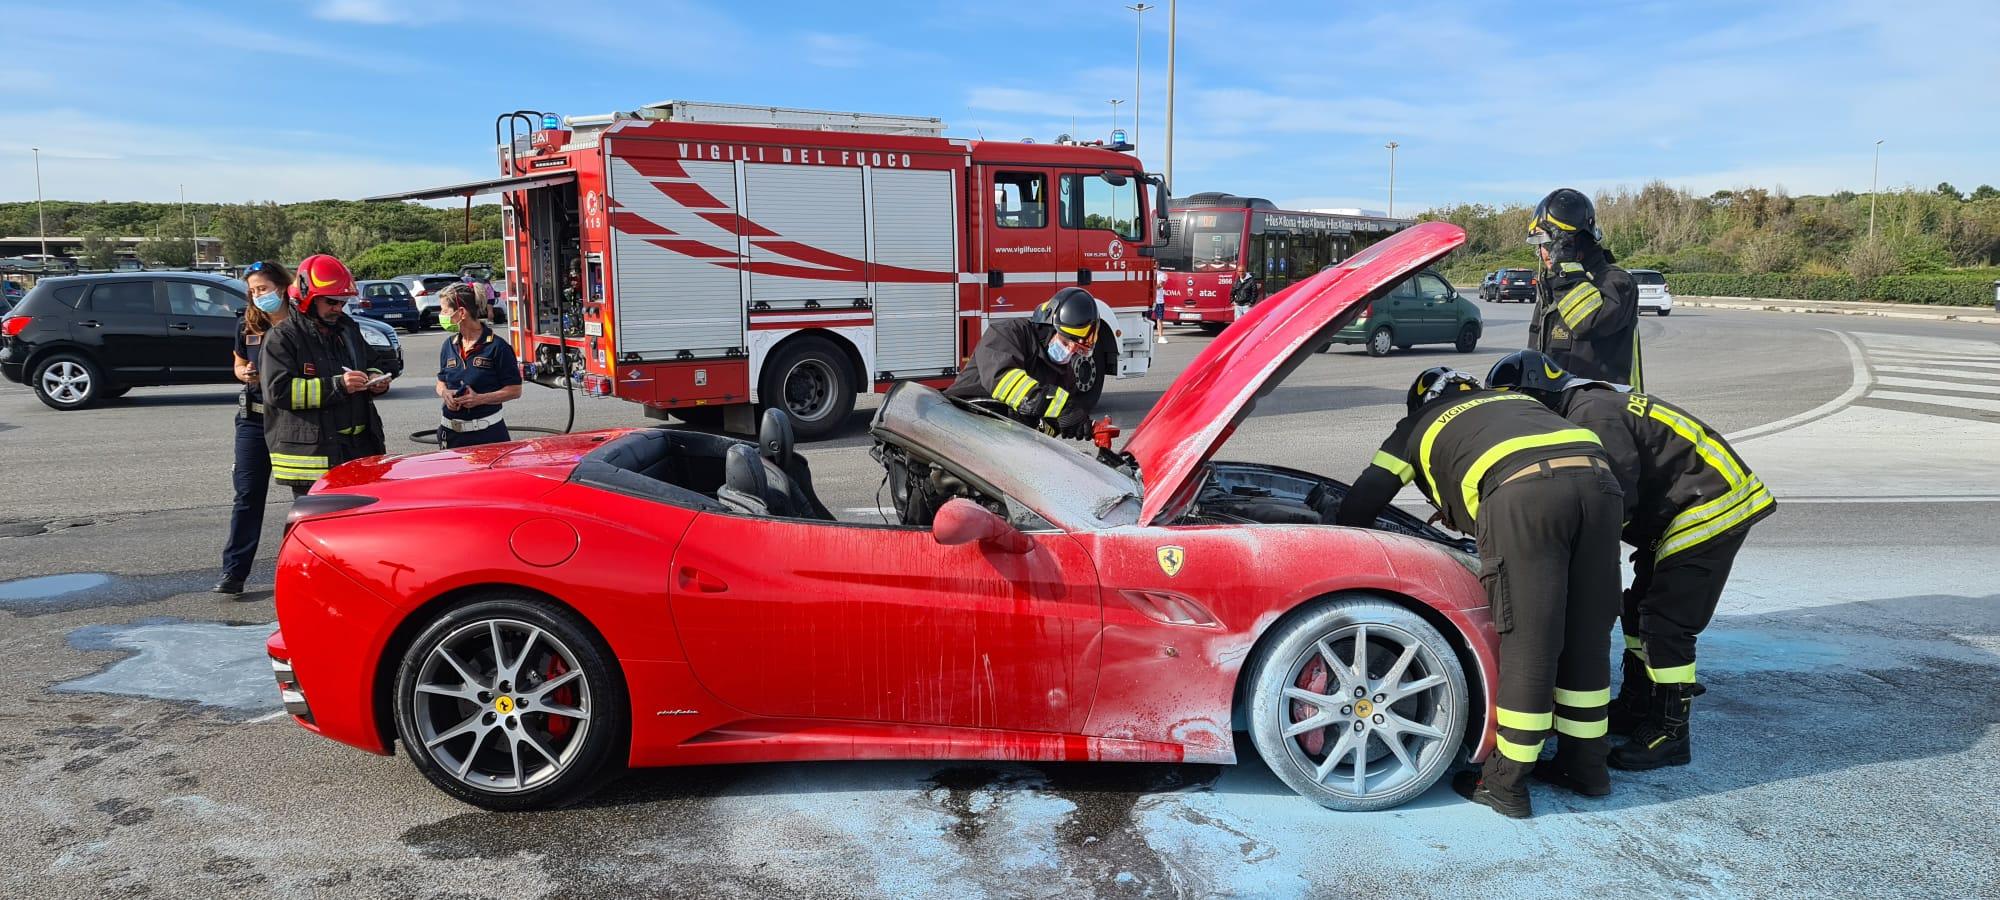 Ferrari incendiatasi a Ostia